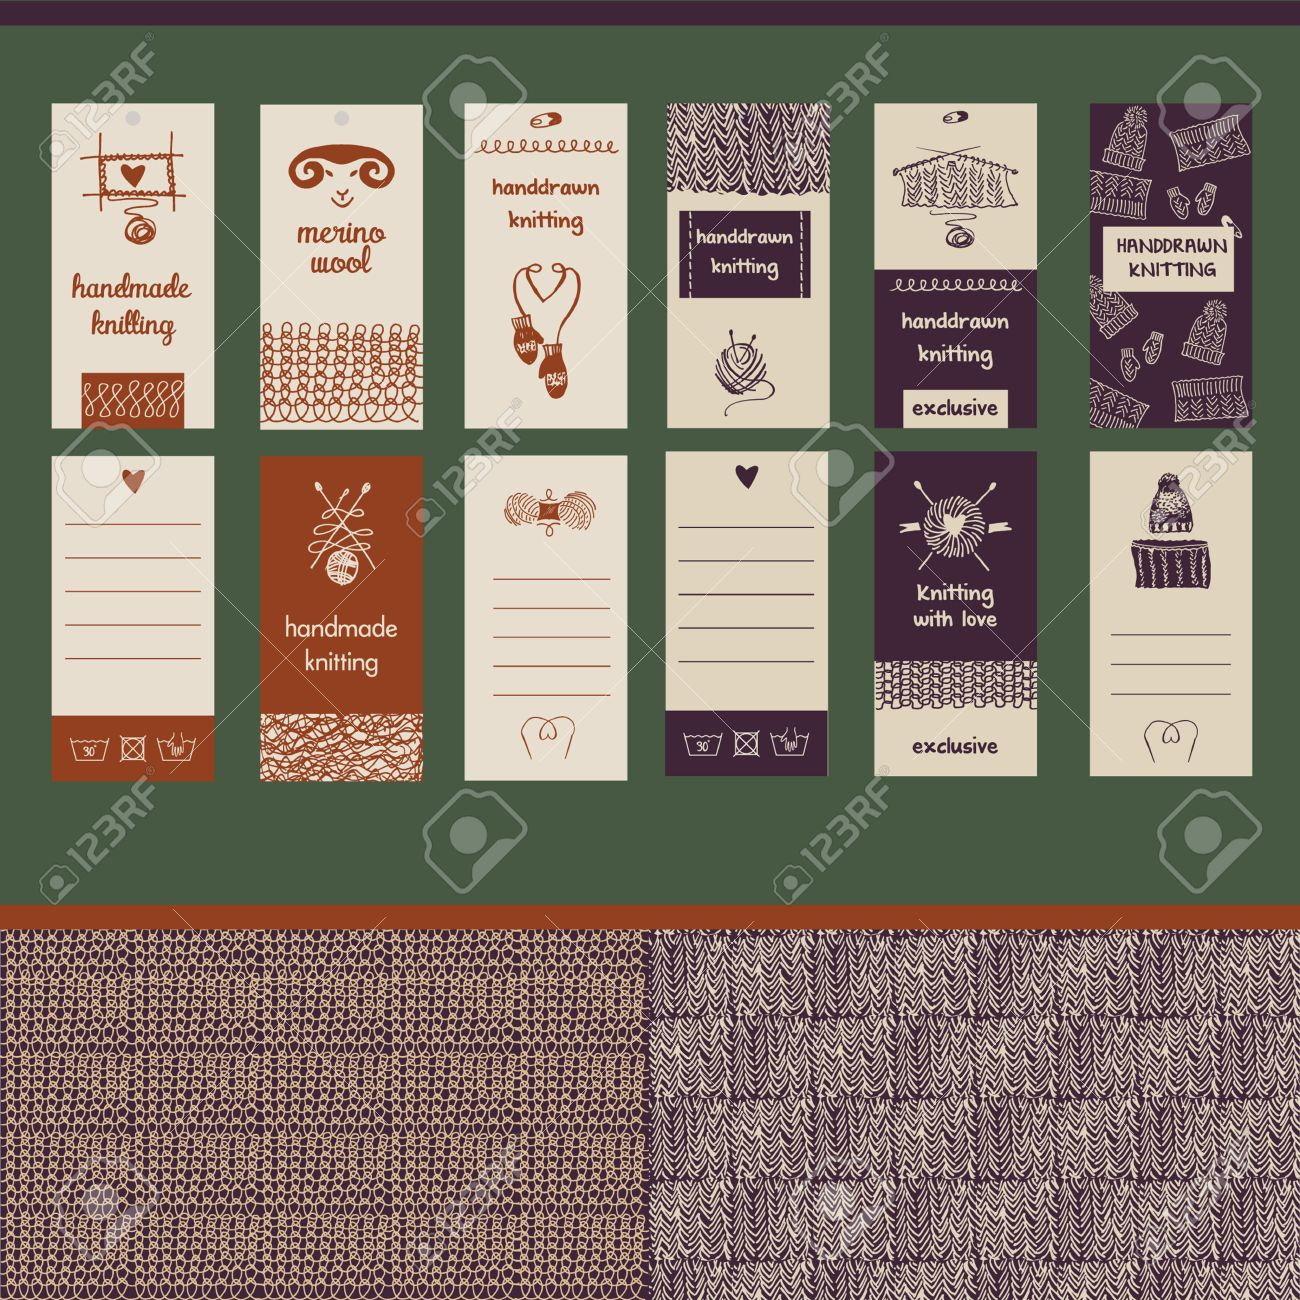 Hand drawn vector illustration vintage lettering business card hand drawn vector illustration vintage lettering business card for wool handmade shop market magicingreecefo Image collections